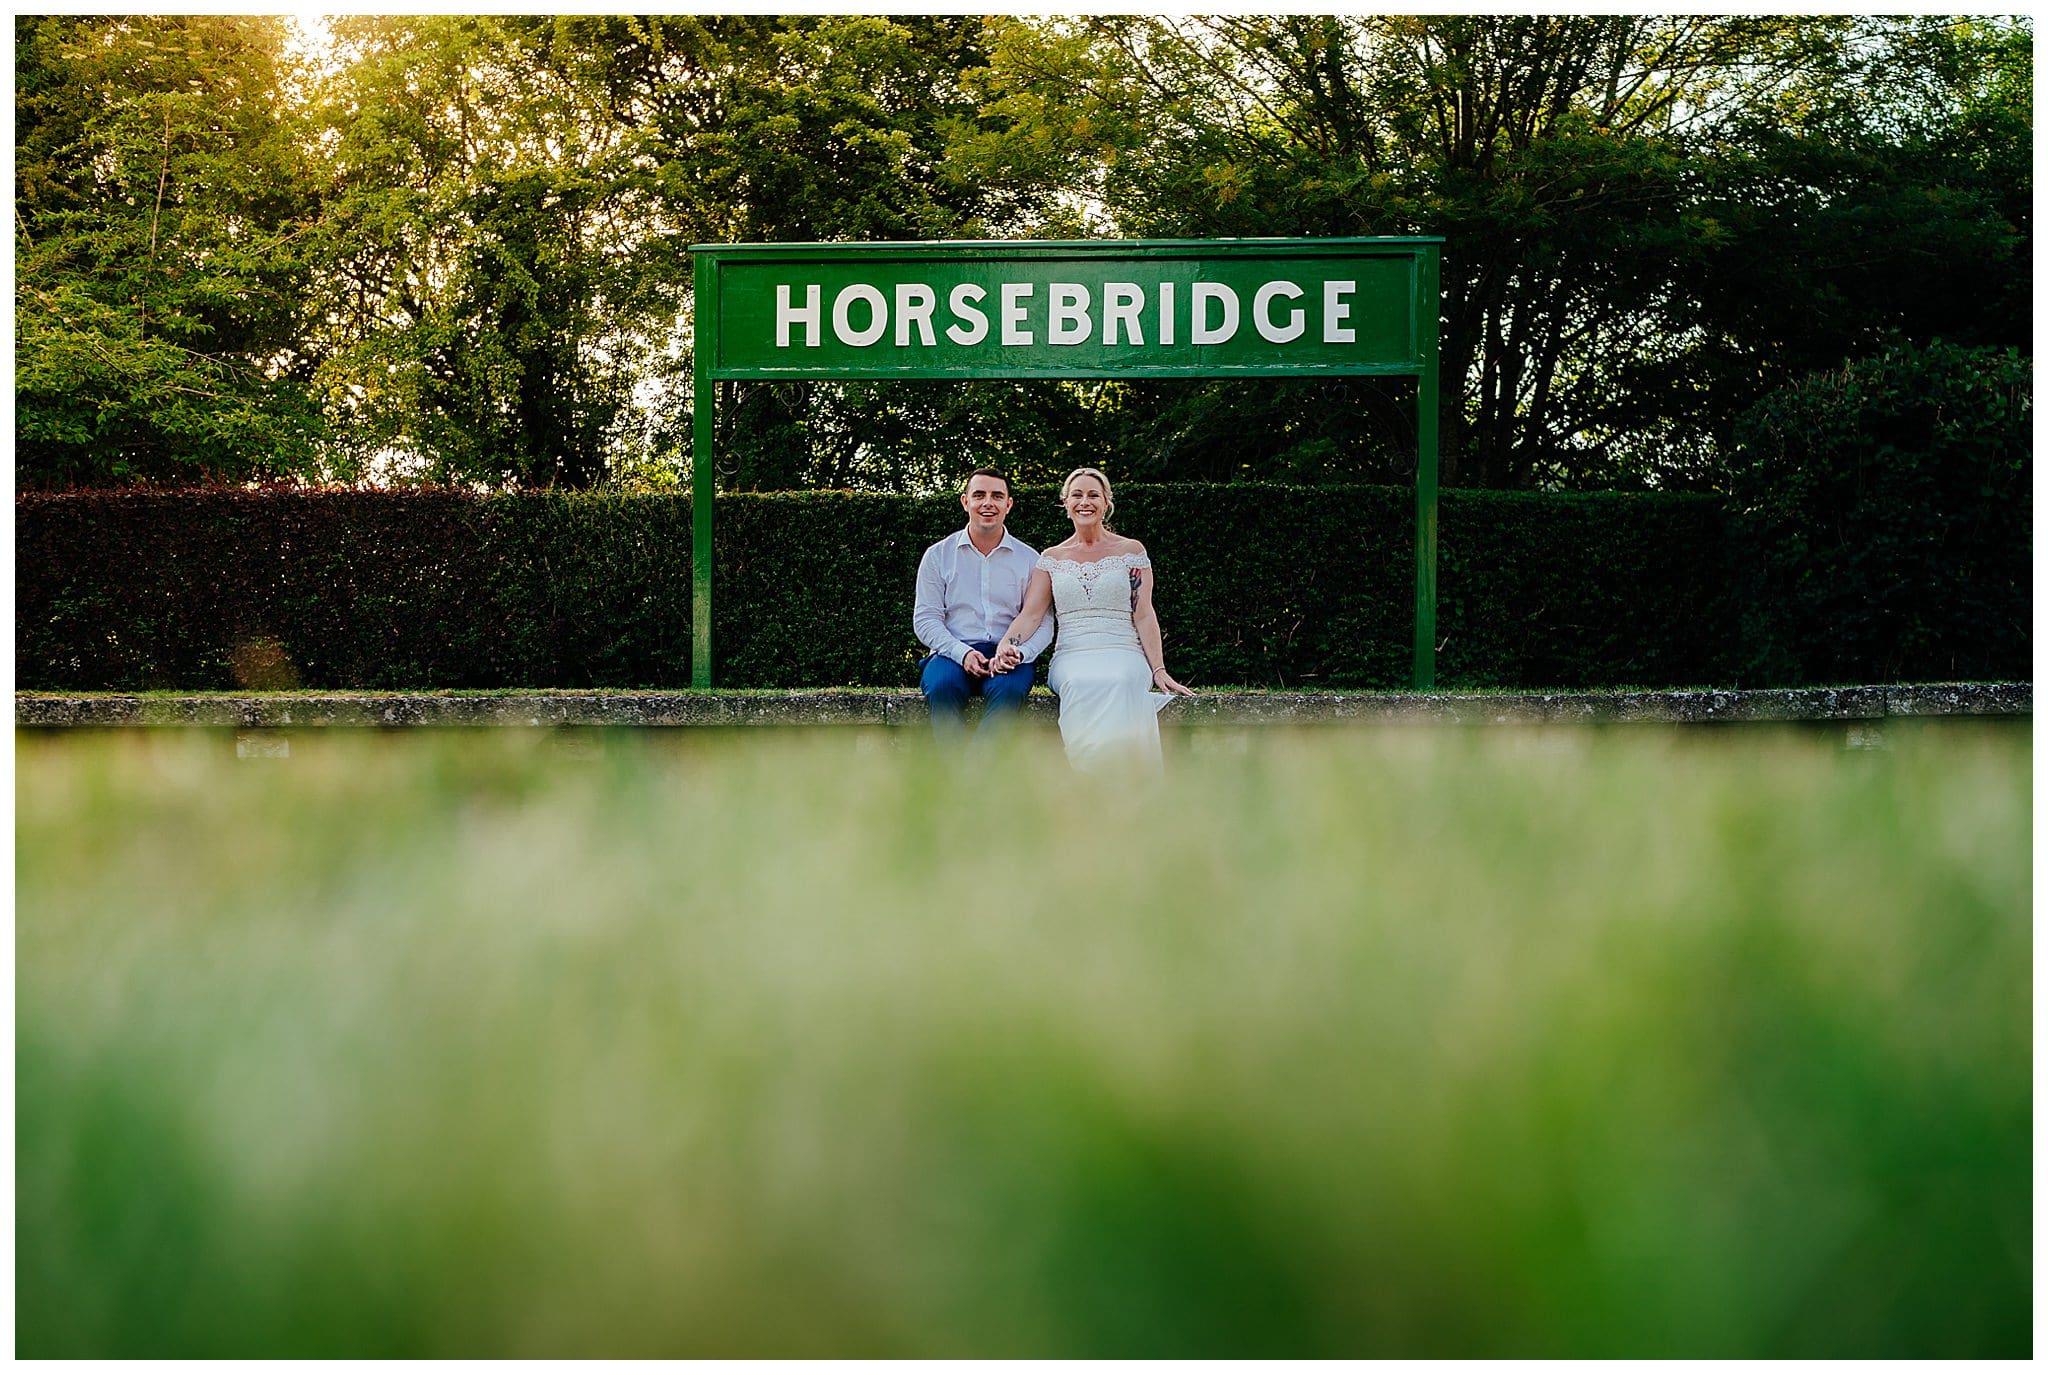 horsebridge station wedding photographer_0288